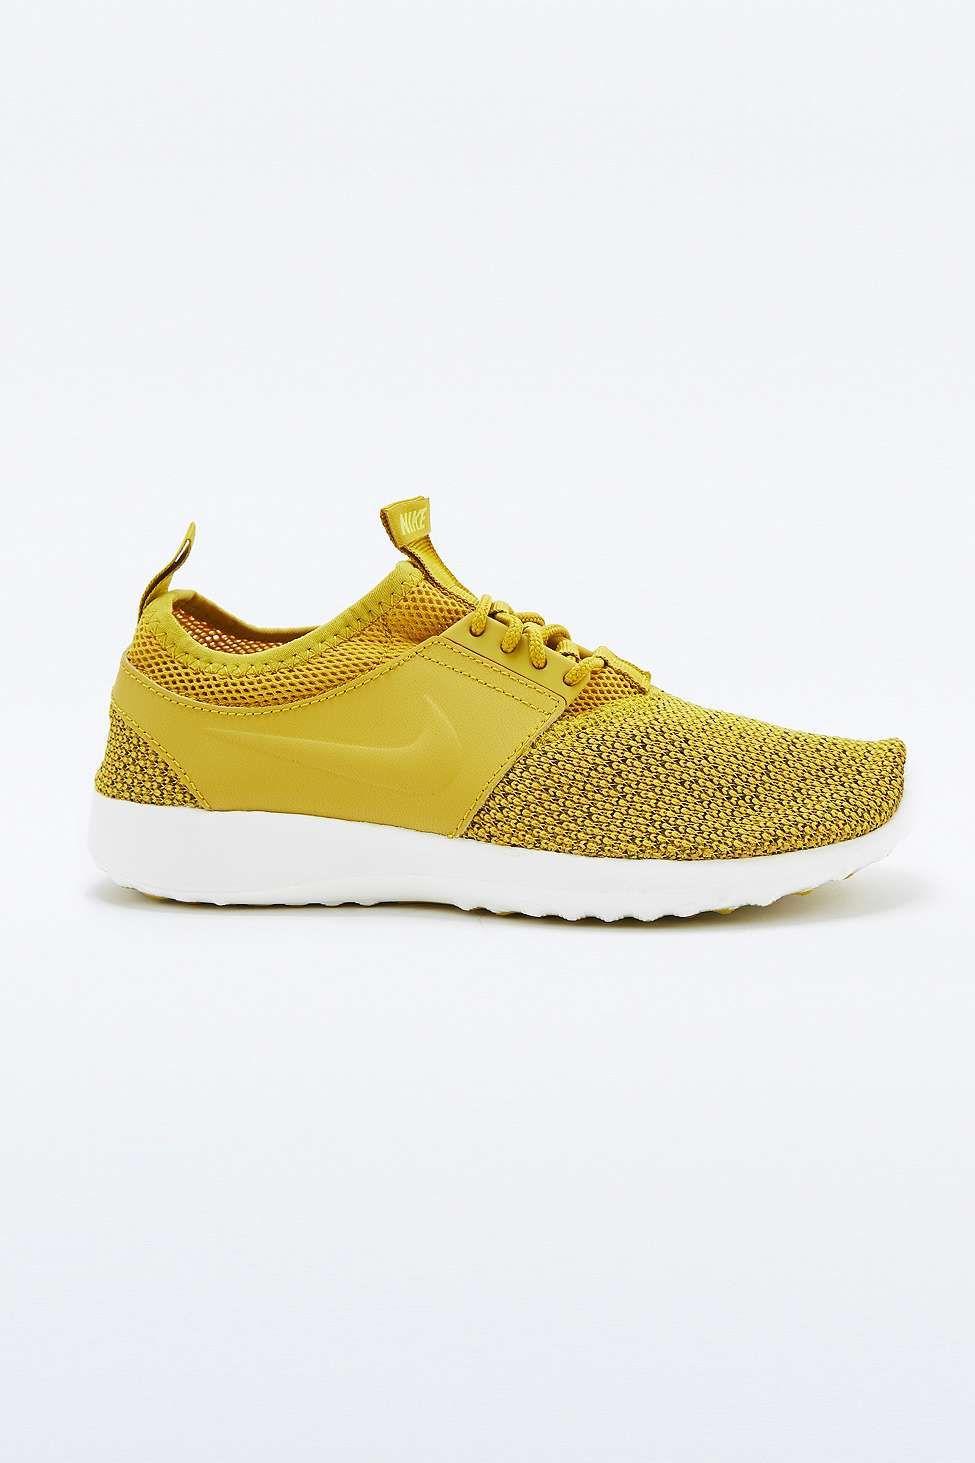 separation shoes 97472 e873b Nike Juvenate Mustard Textile Trainers